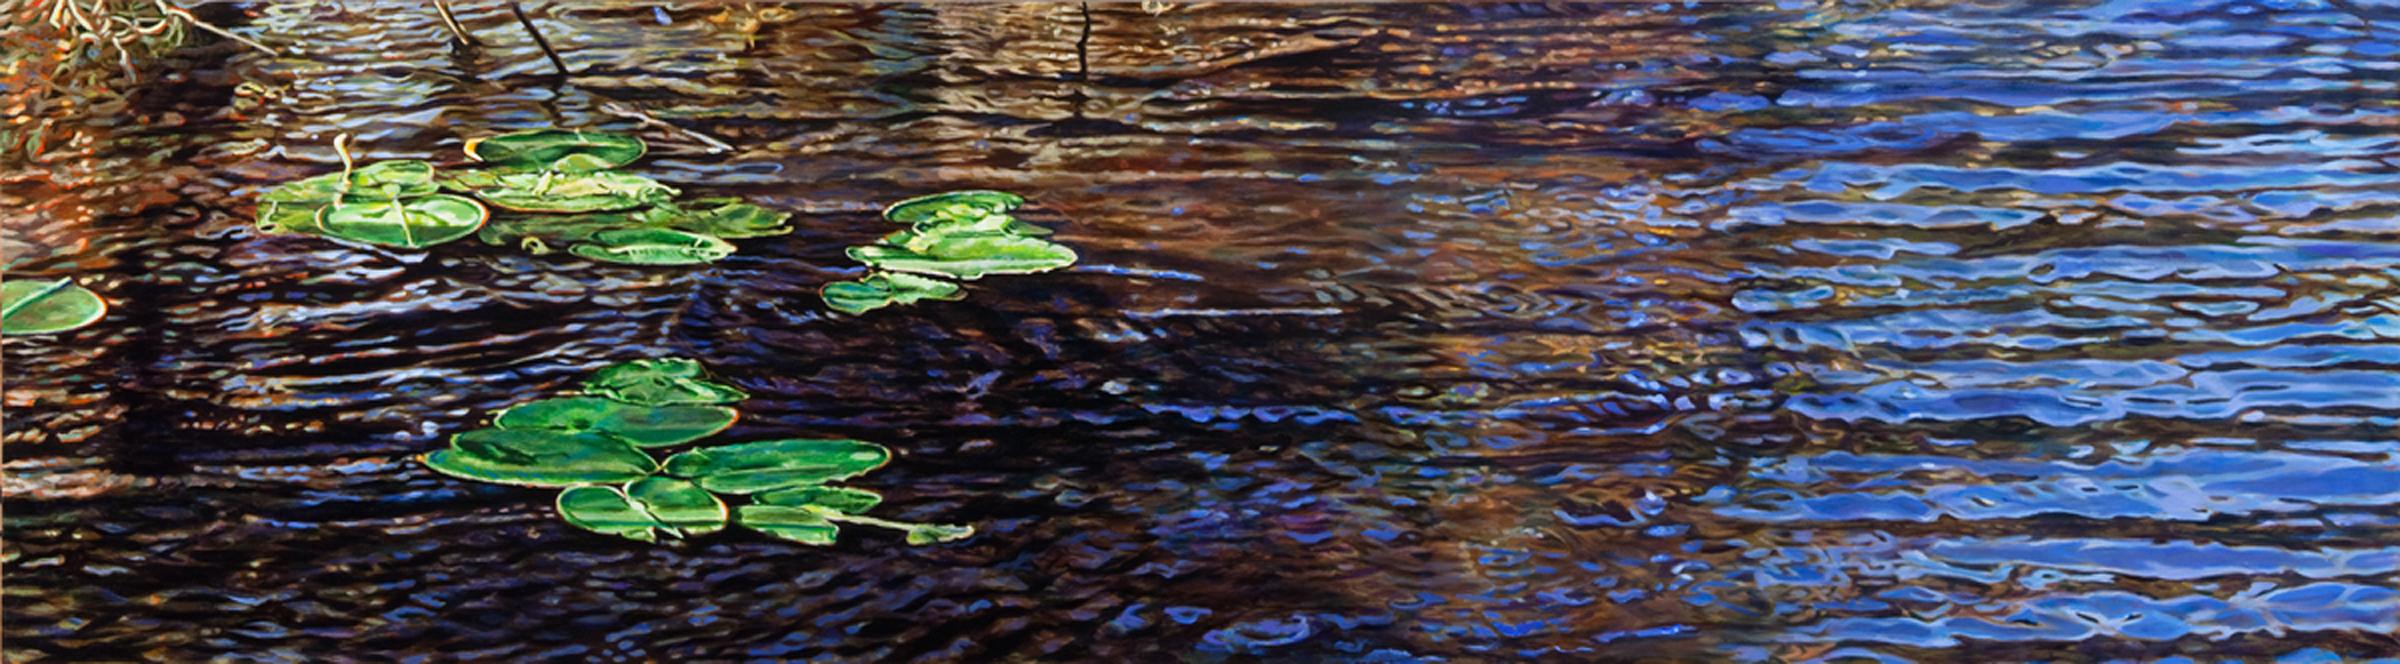 "Undulation , acrylic on canvas, 24 x 86"", 2011"